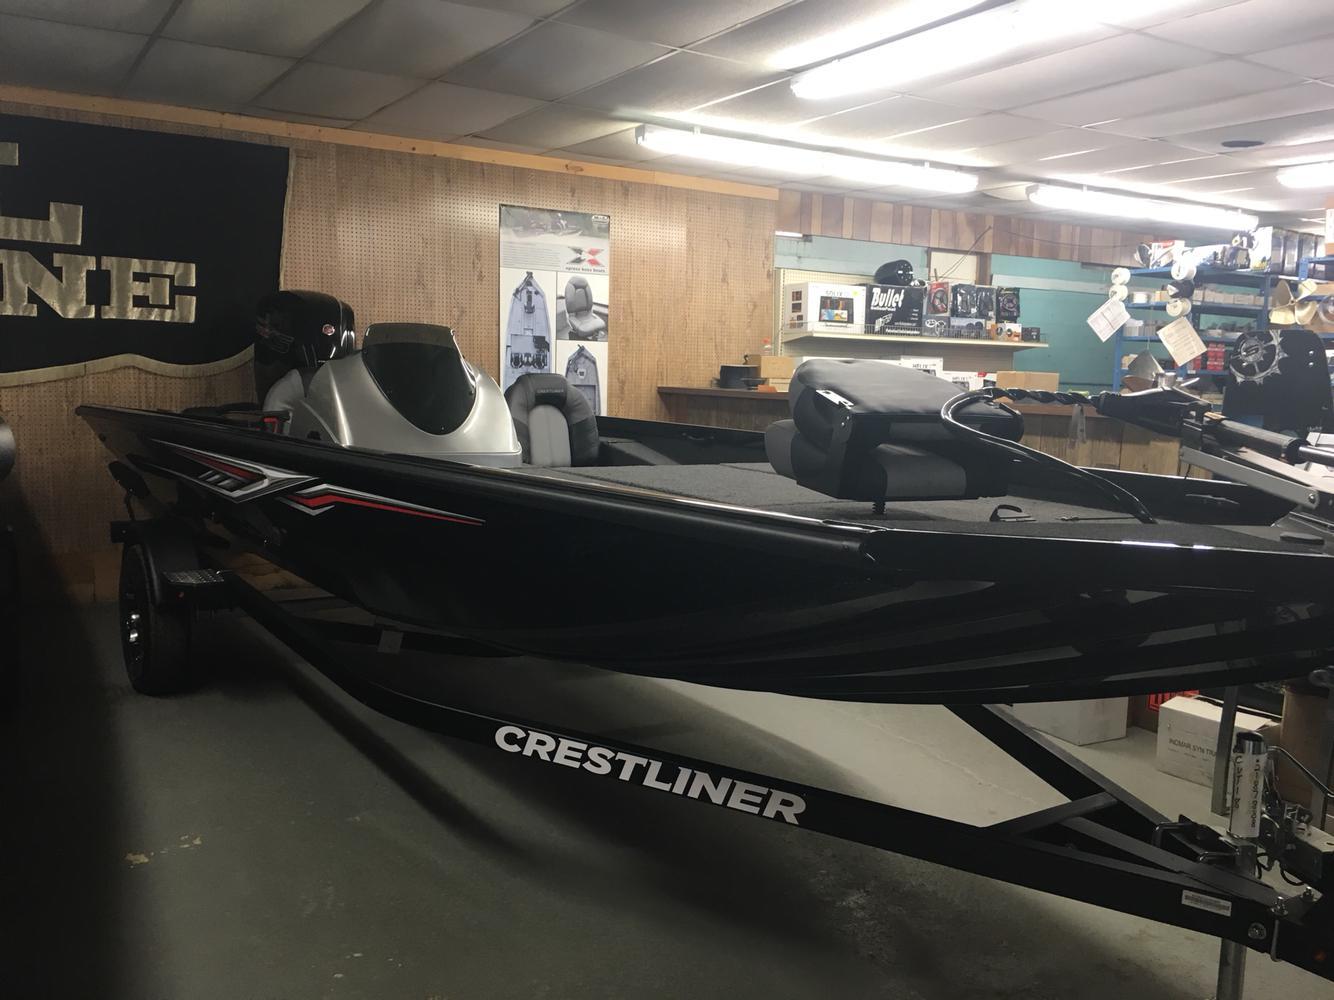 crestliner boat wiring harness all wiring diagram rh 16 agetr isabel in australien de